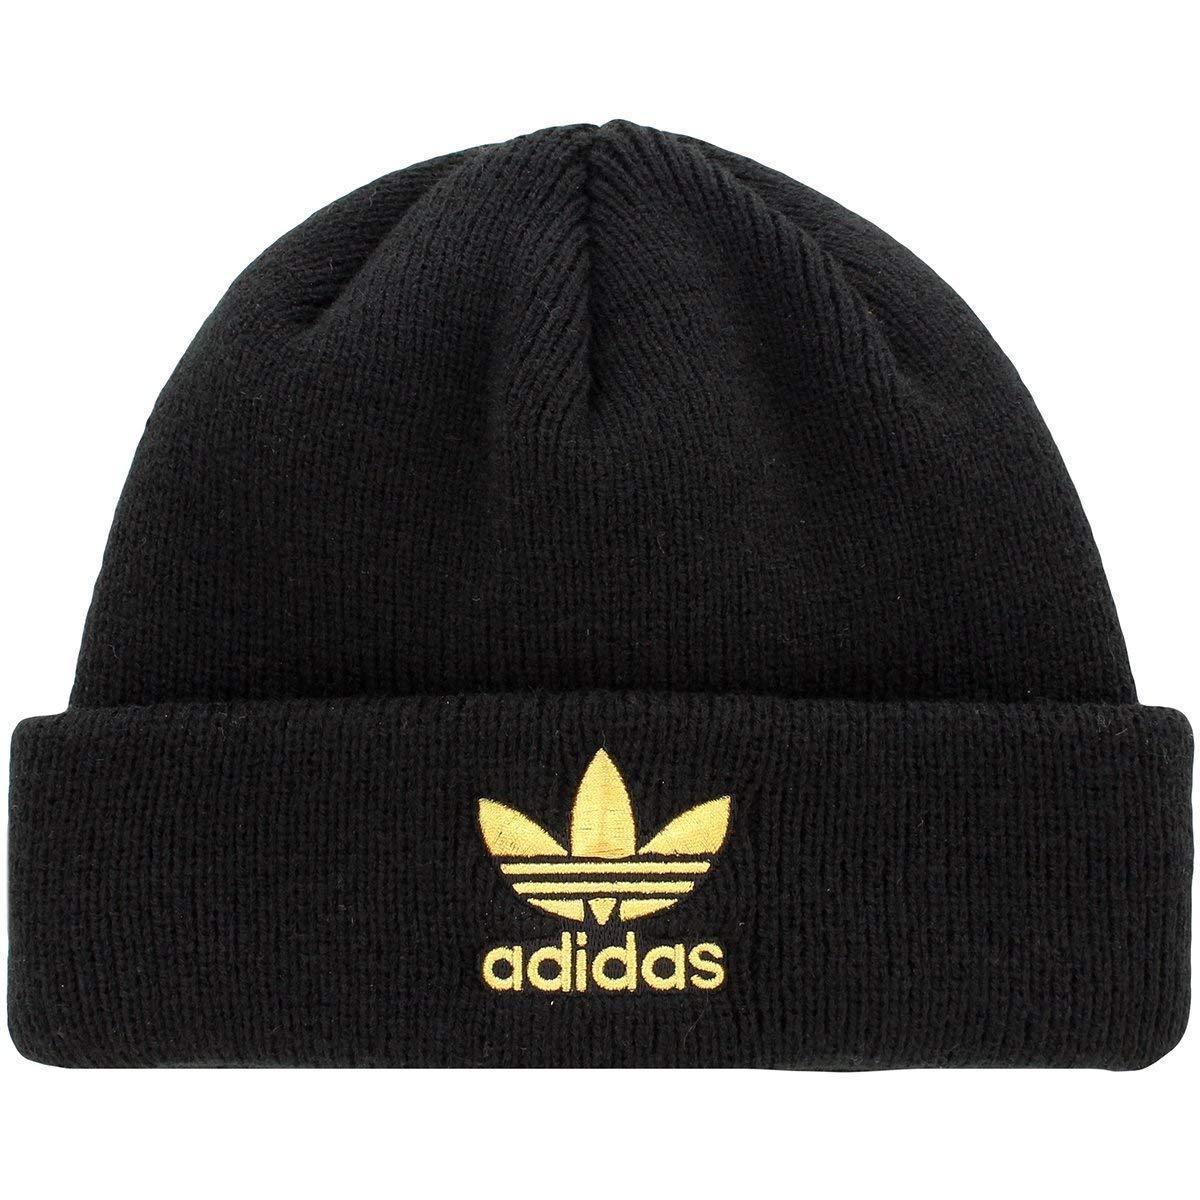 c9086ef2cb6877 Amazon.com: Adidas Womens Originals Trefoil Ii Knit Beanie Black/Gold …:  Clothing